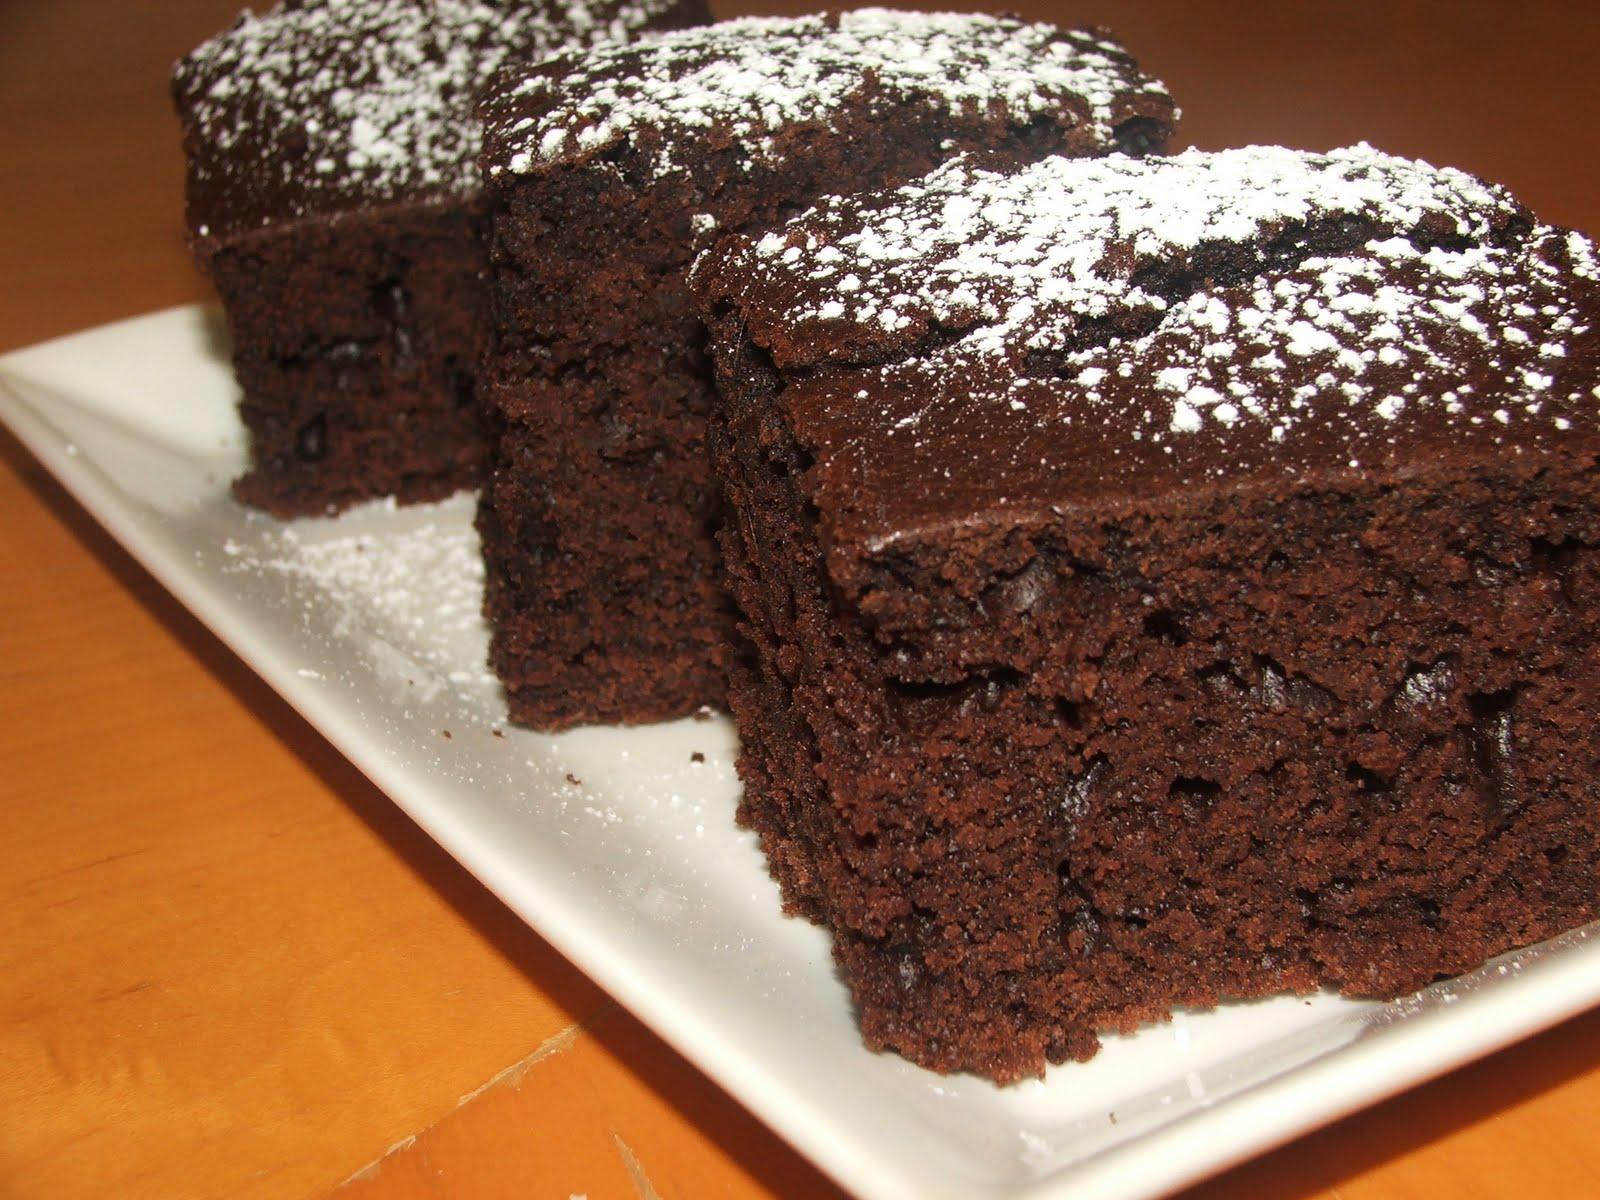 Çikolatalı Kek Sunumuu